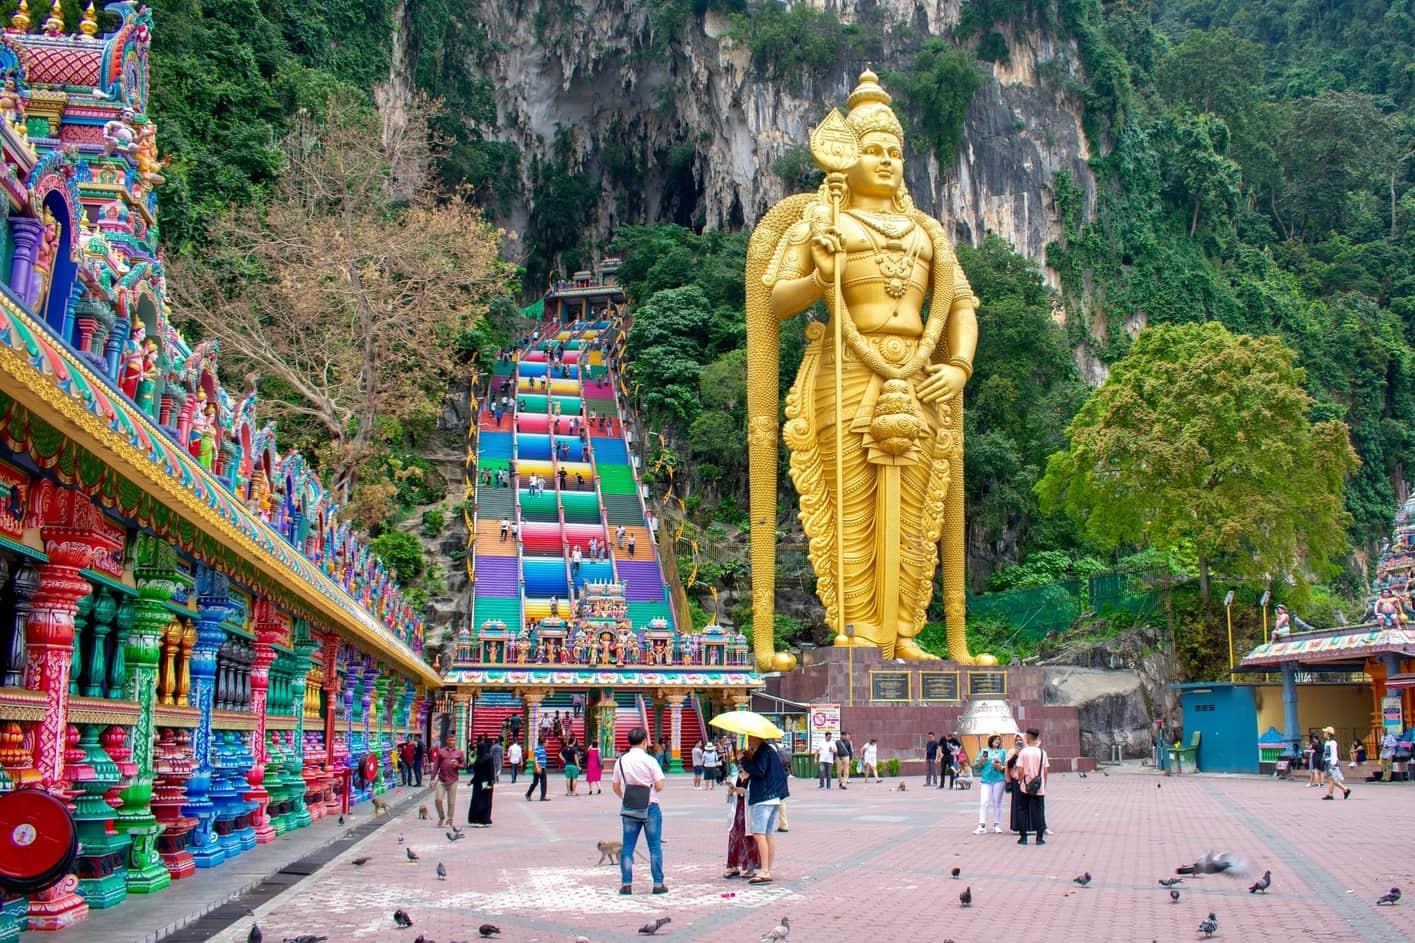 Batu Caves, tourist attractions in Kuala Lumpur